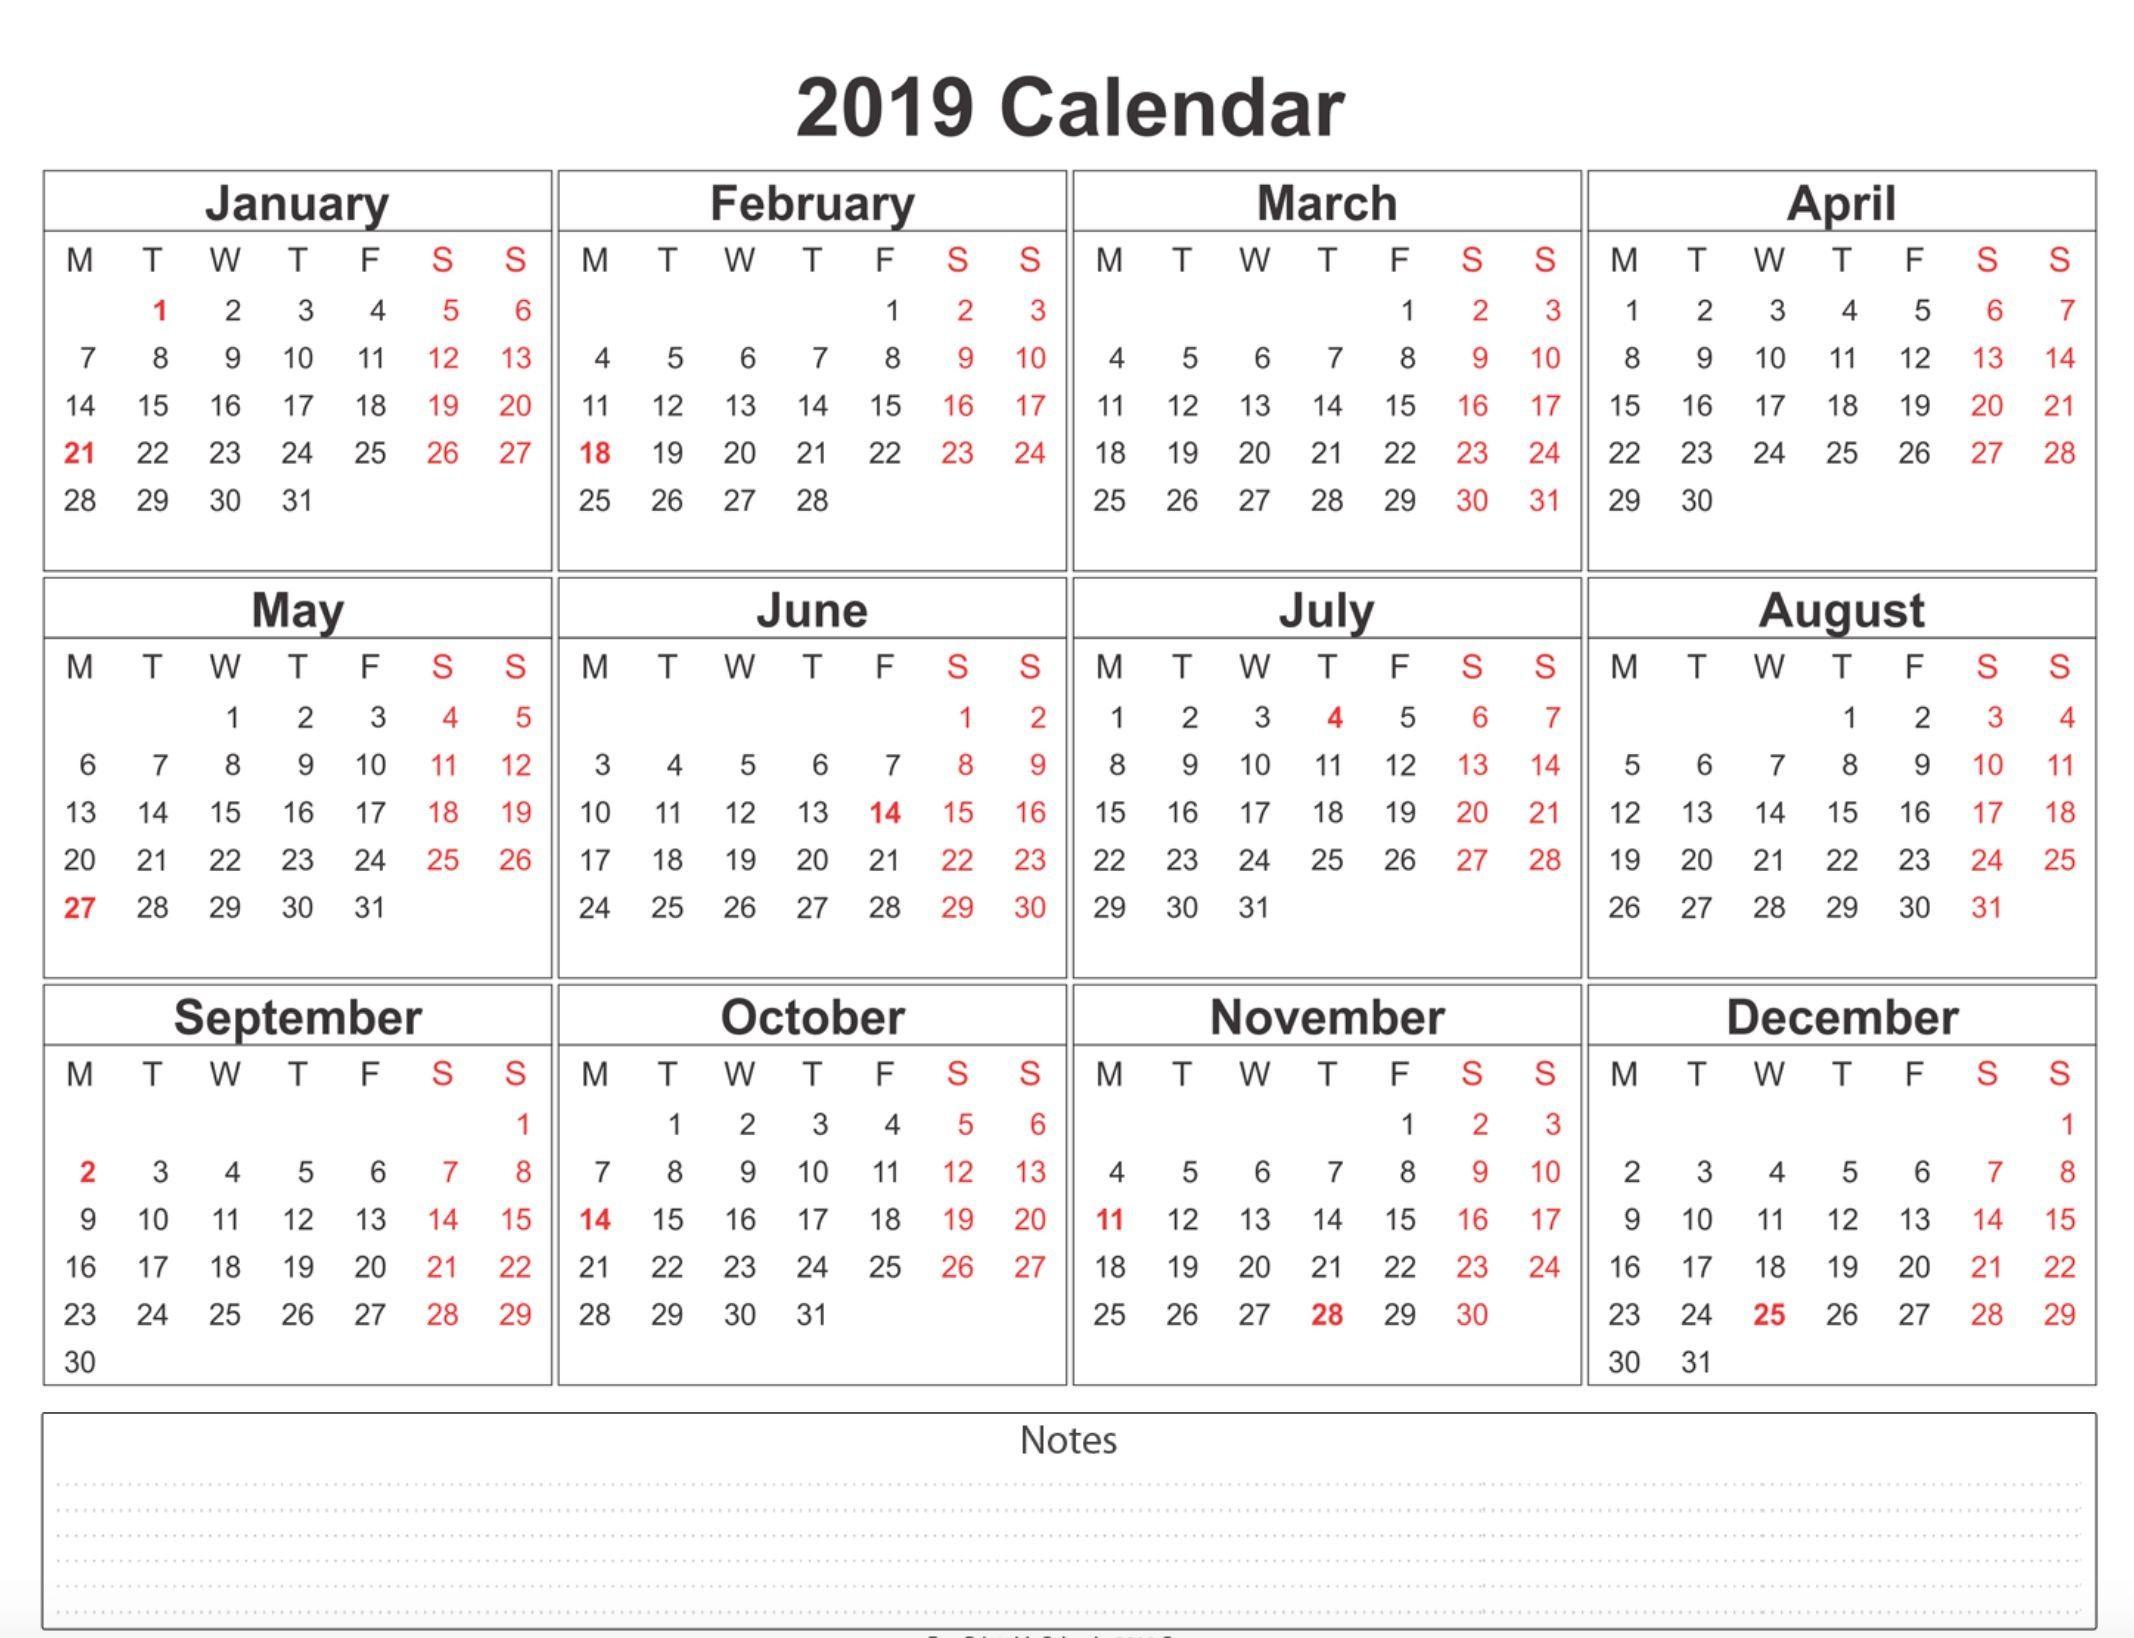 2019 Weekly Calendar Printable | 2019 Calendars | 12 Month Calendar intended for Blank Printable Calendar 12 Month